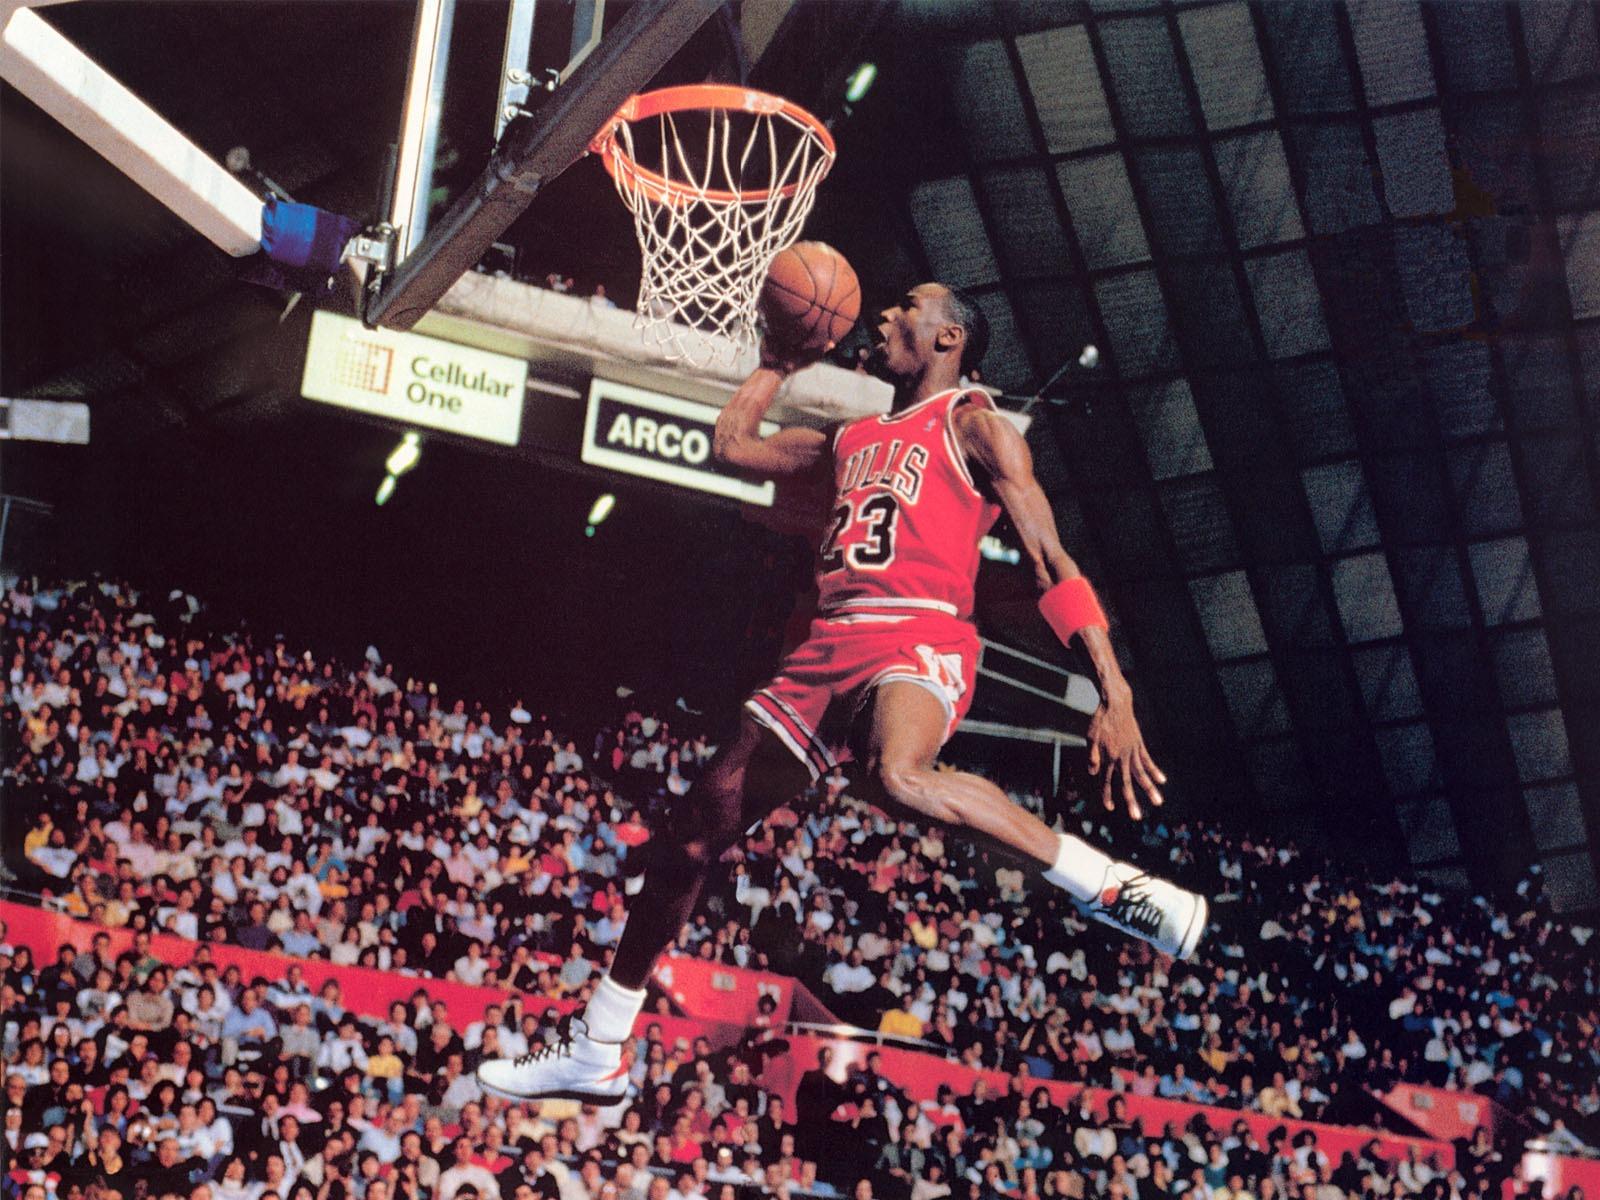 Michael Jordan Hd Wallpapers: Michael Jordan HD Wallpaper